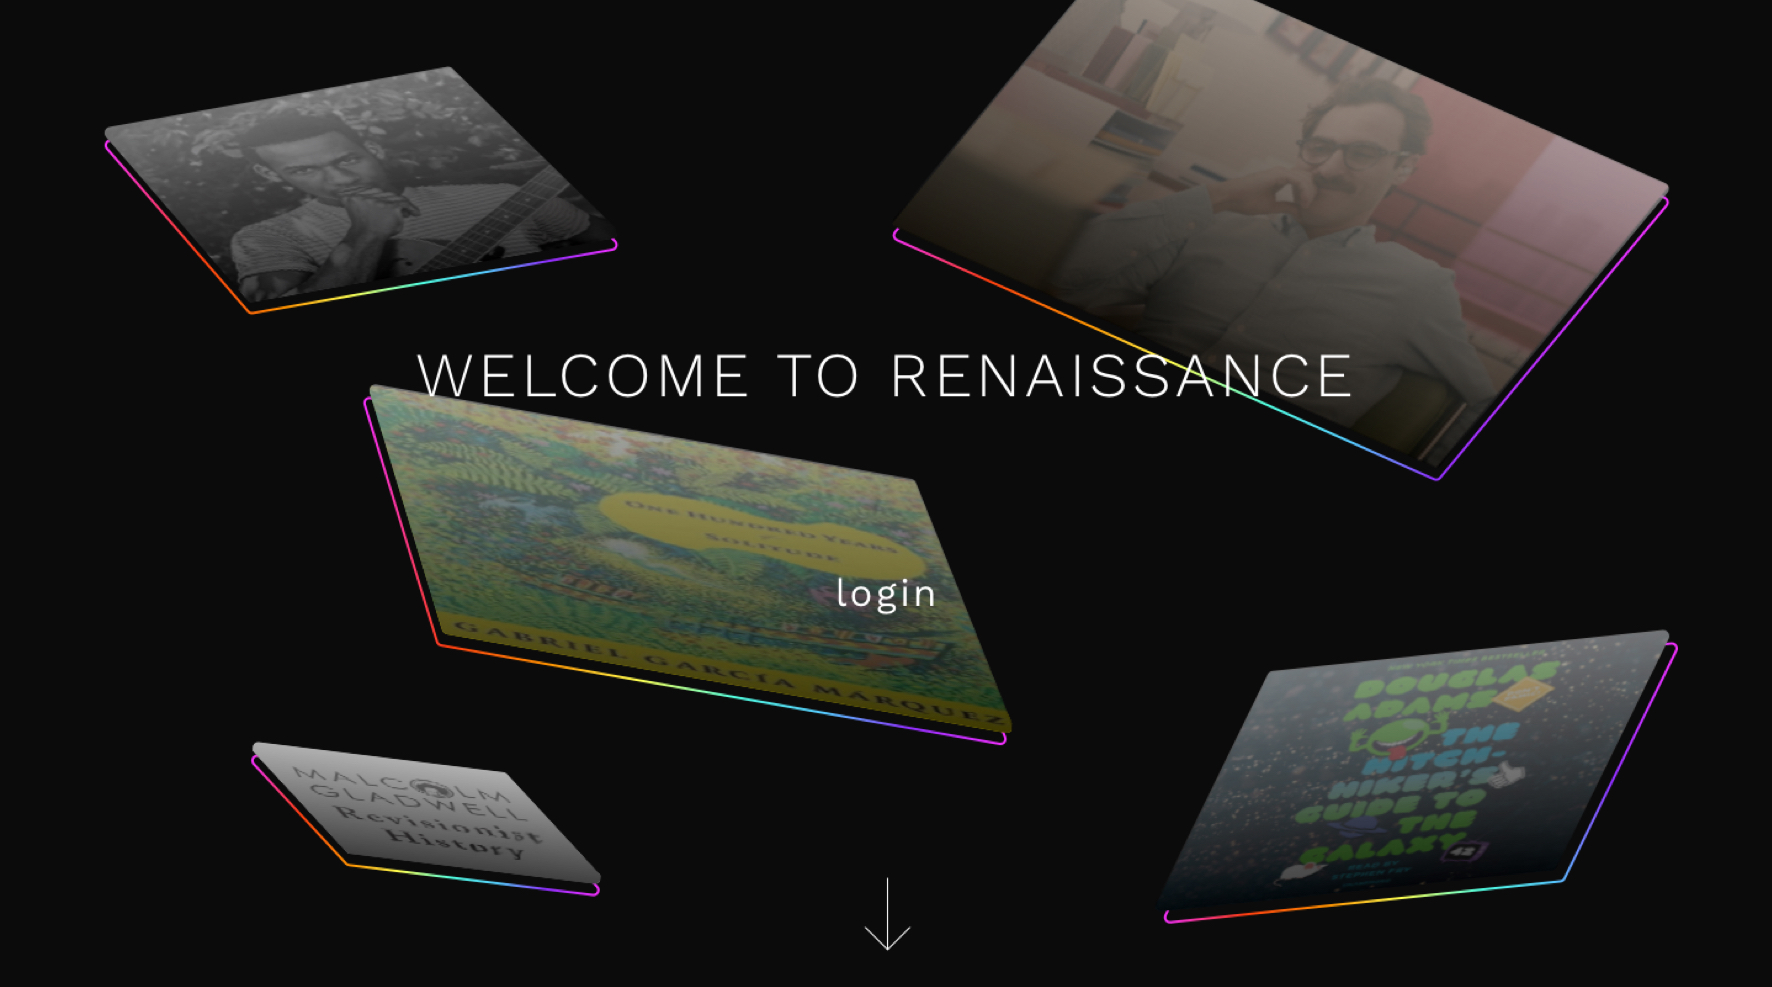 Renaissance Noah Semus Spring 2018